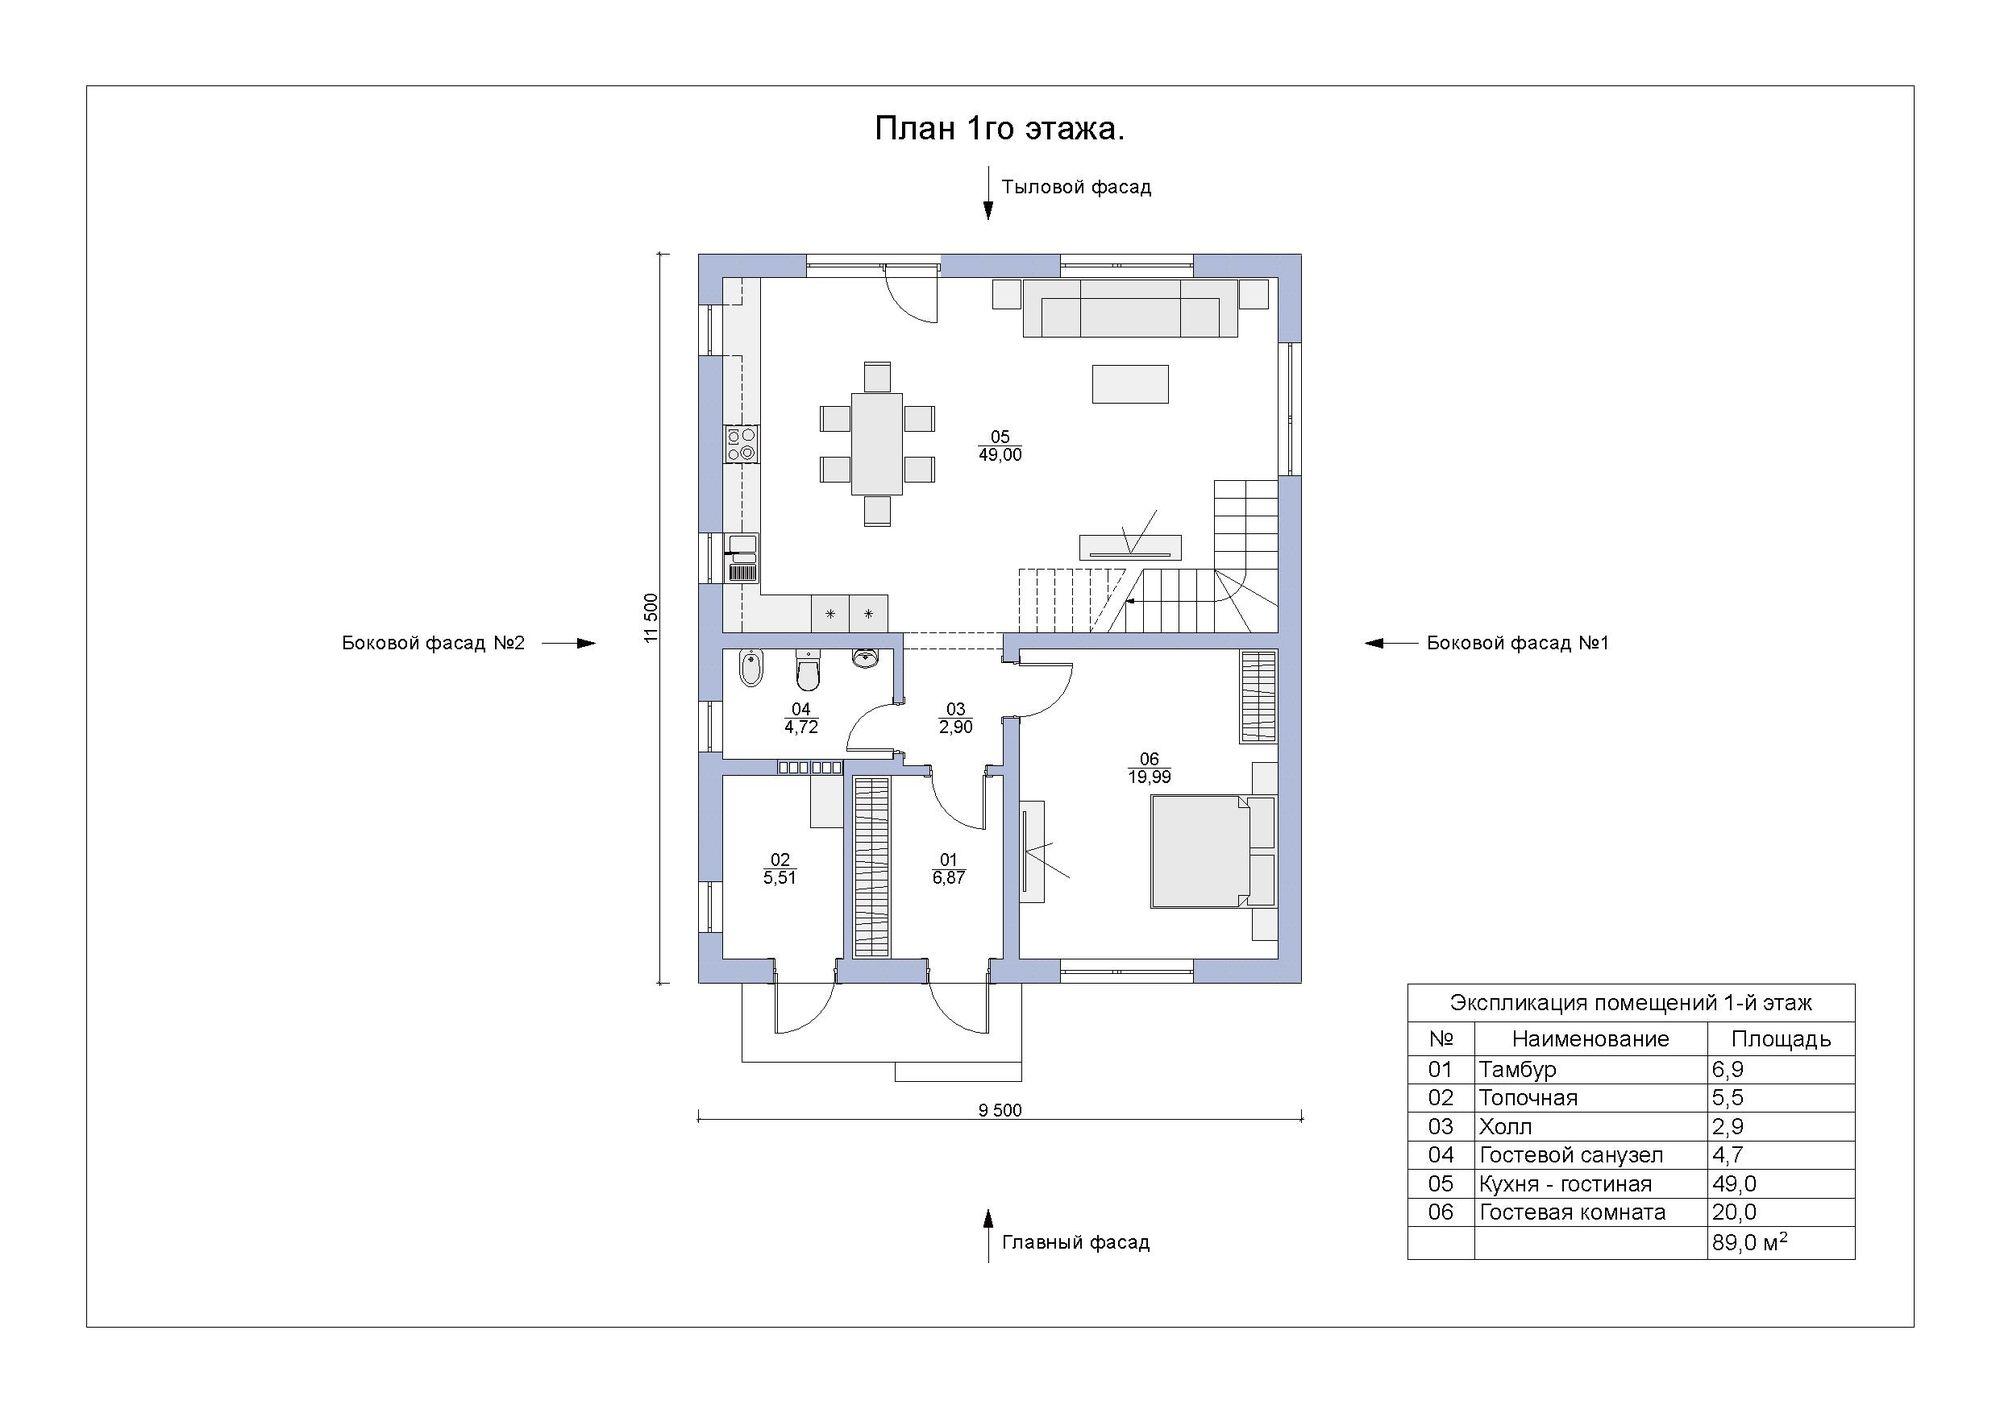 Аякс - План 1го этажа